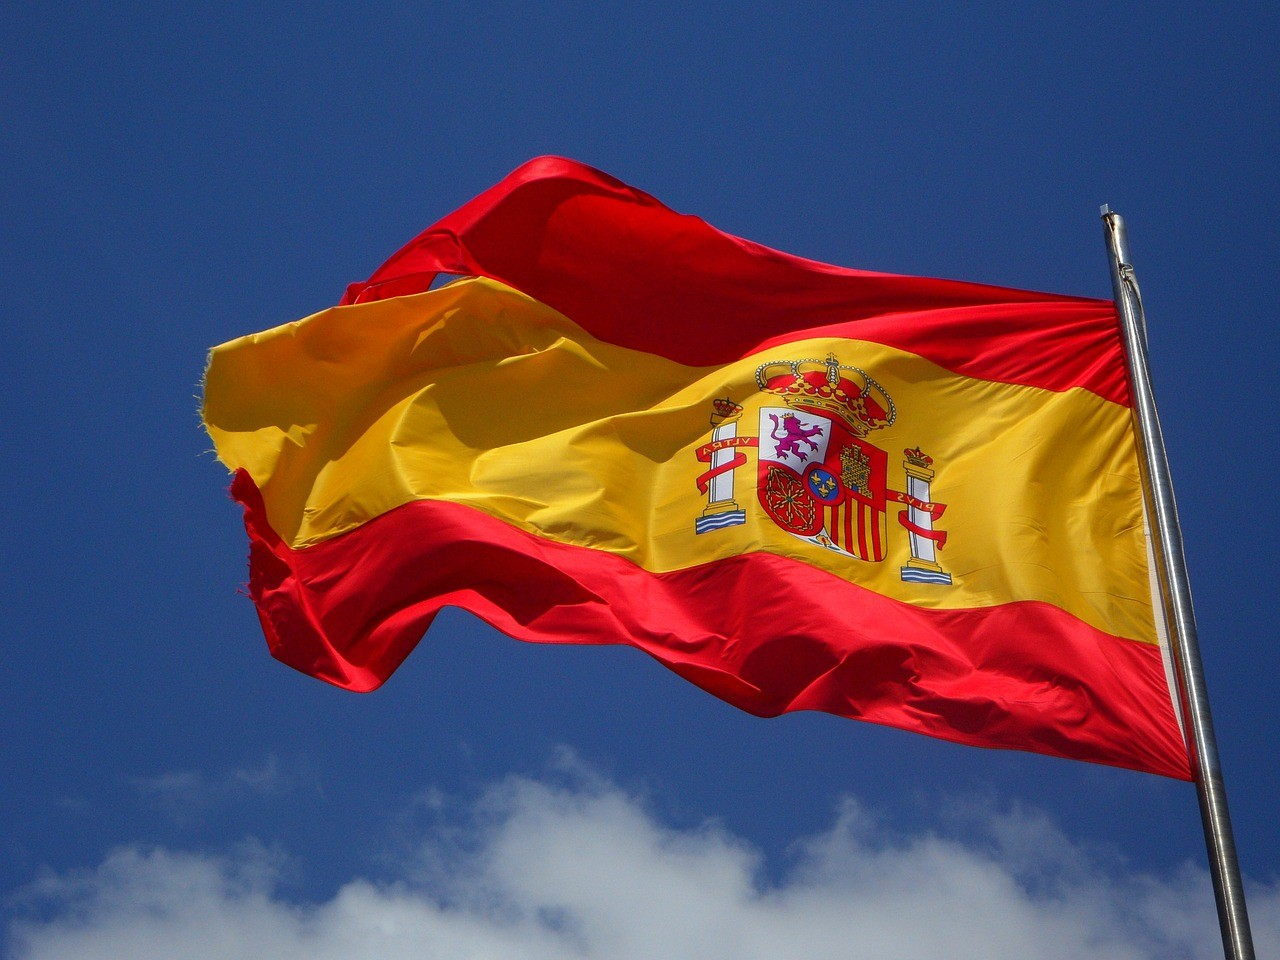 aprire un bar in Spagna